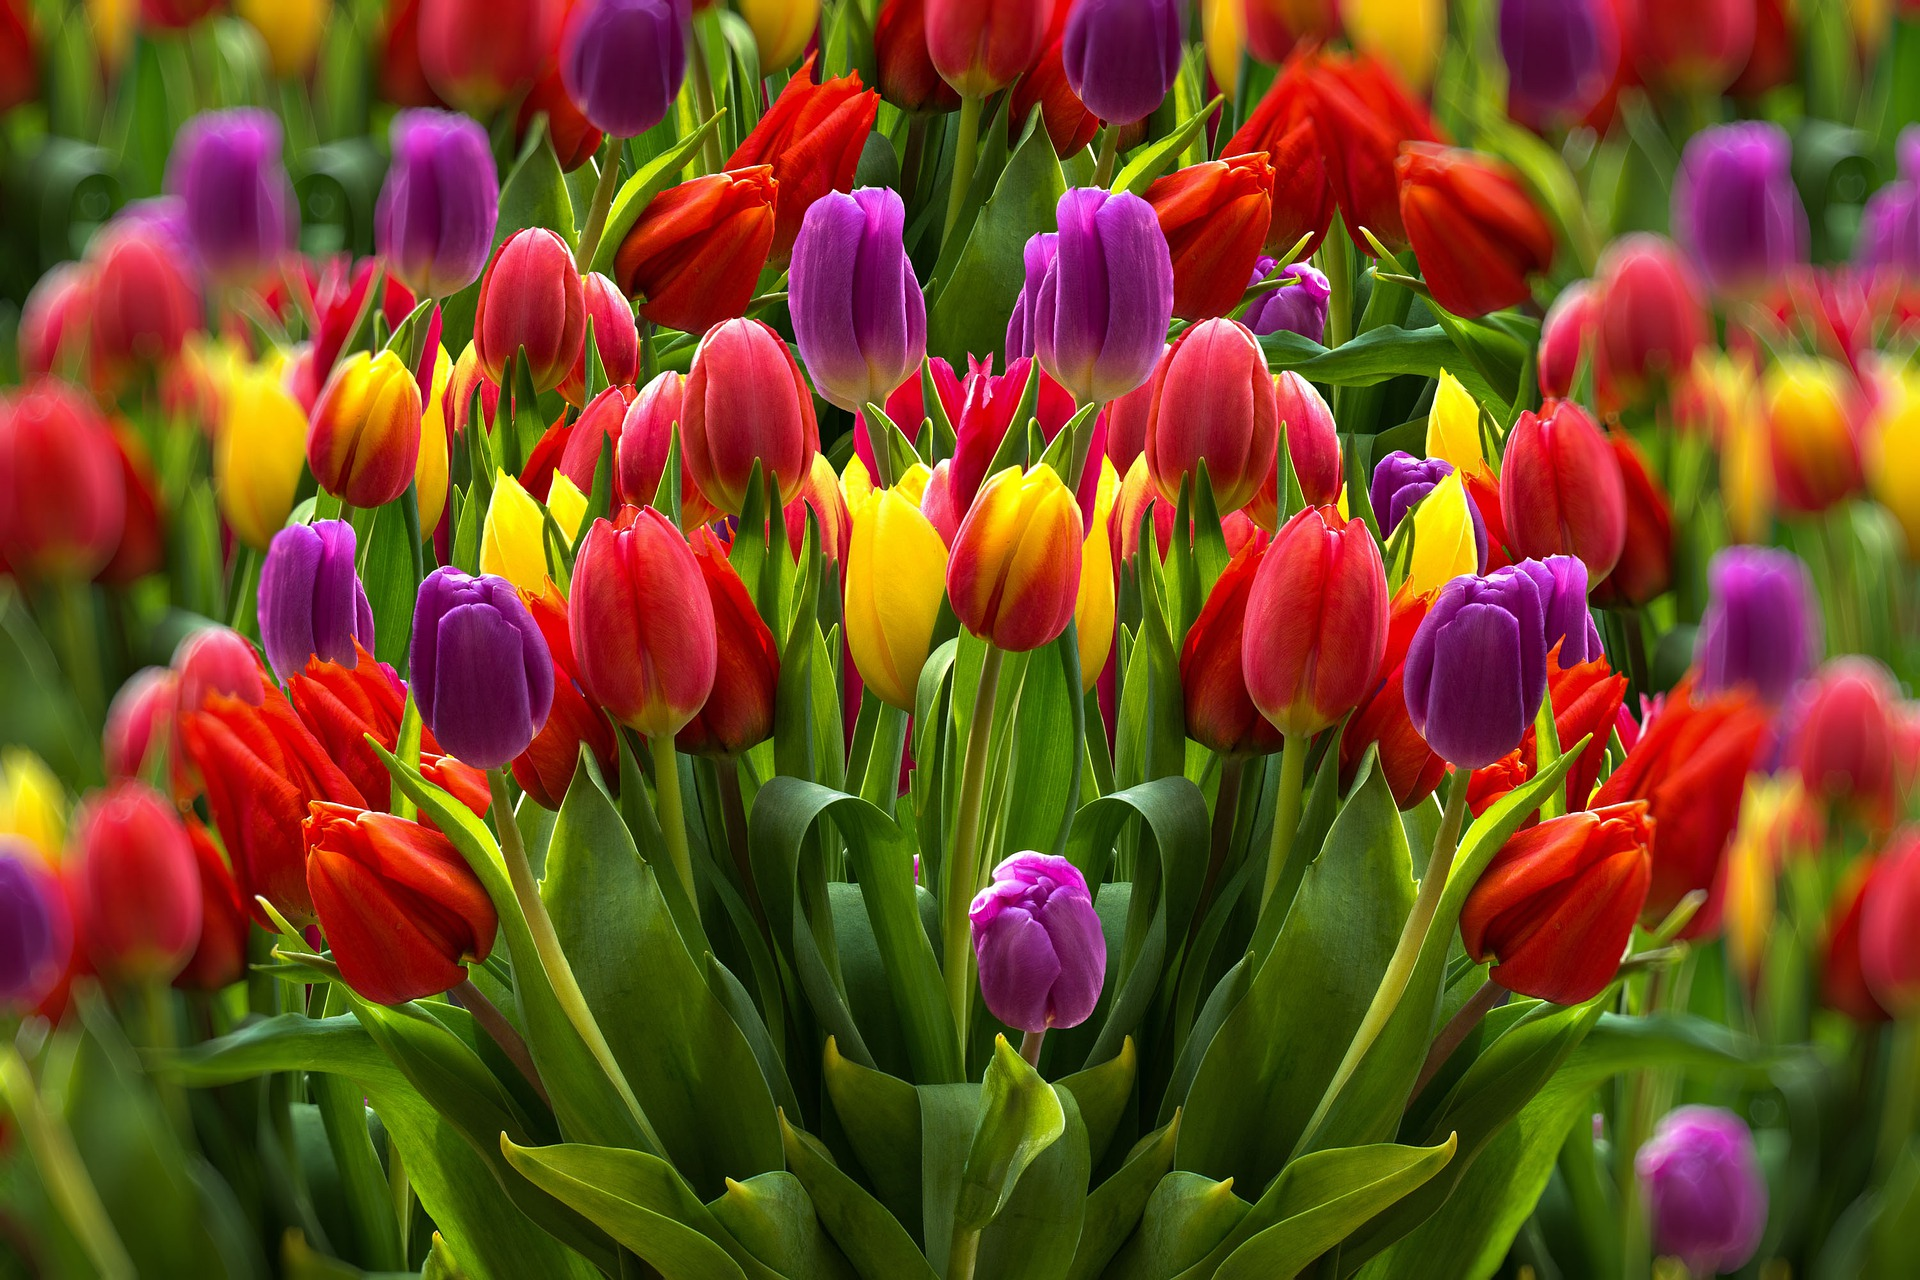 tulips-4564795_1920.jpg